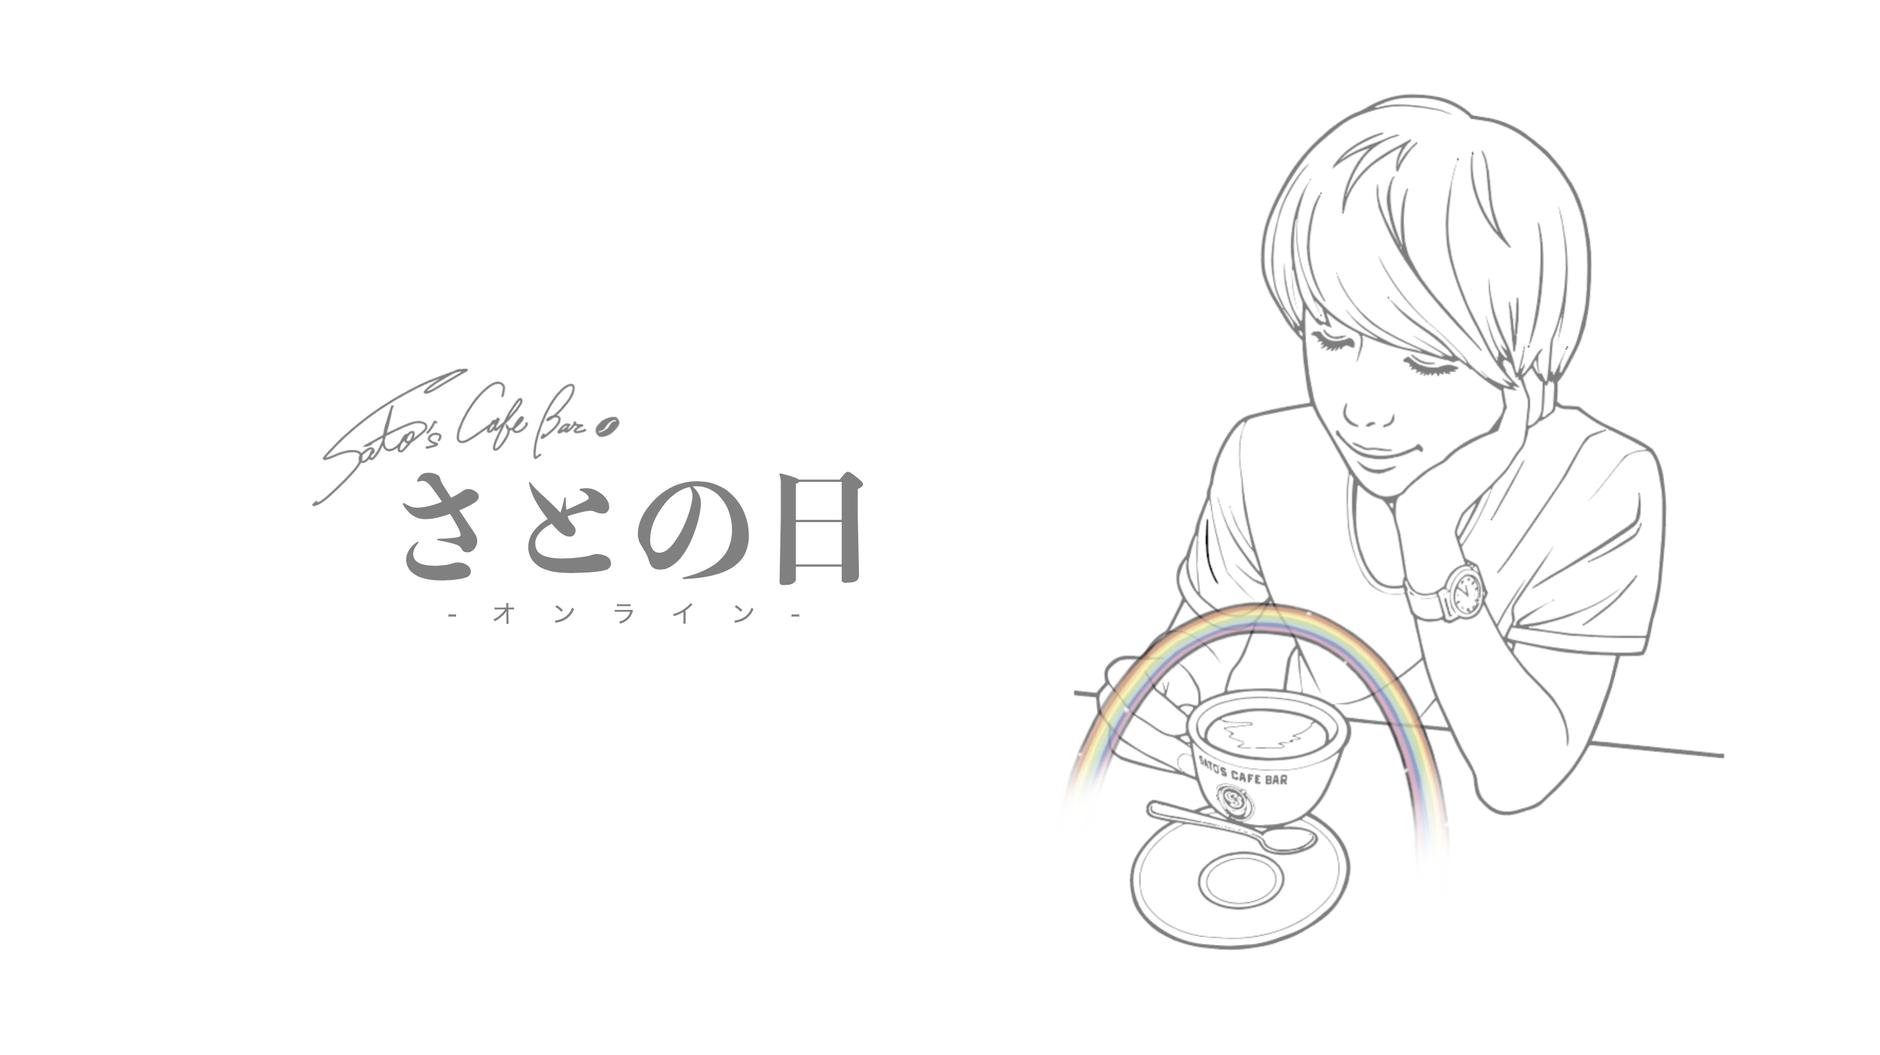 SATO'S CAFE BAR 先行販売オフィシャルECストア